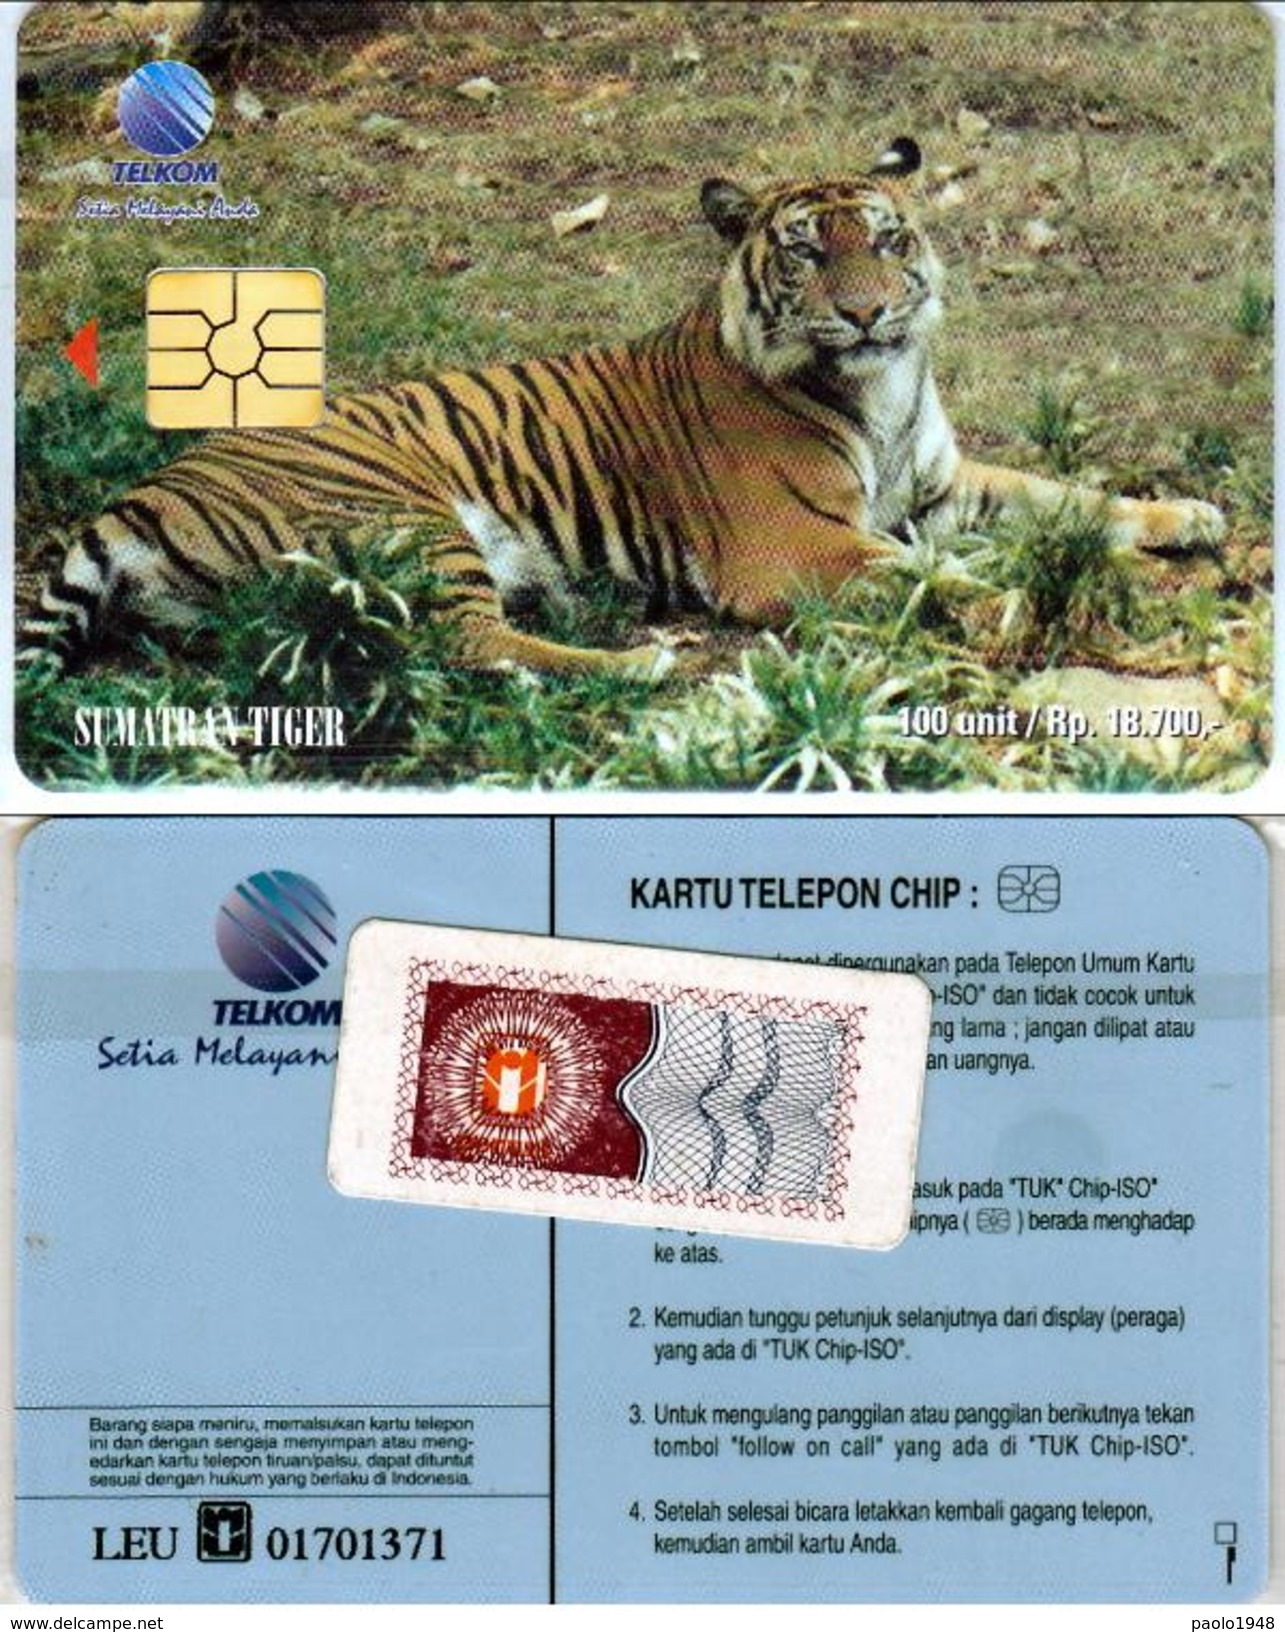 INDONESIA INDONESIEN - SS 66 Sumatra Tiger Horizontal - Mint With Original Blister- RRR - Indonesia